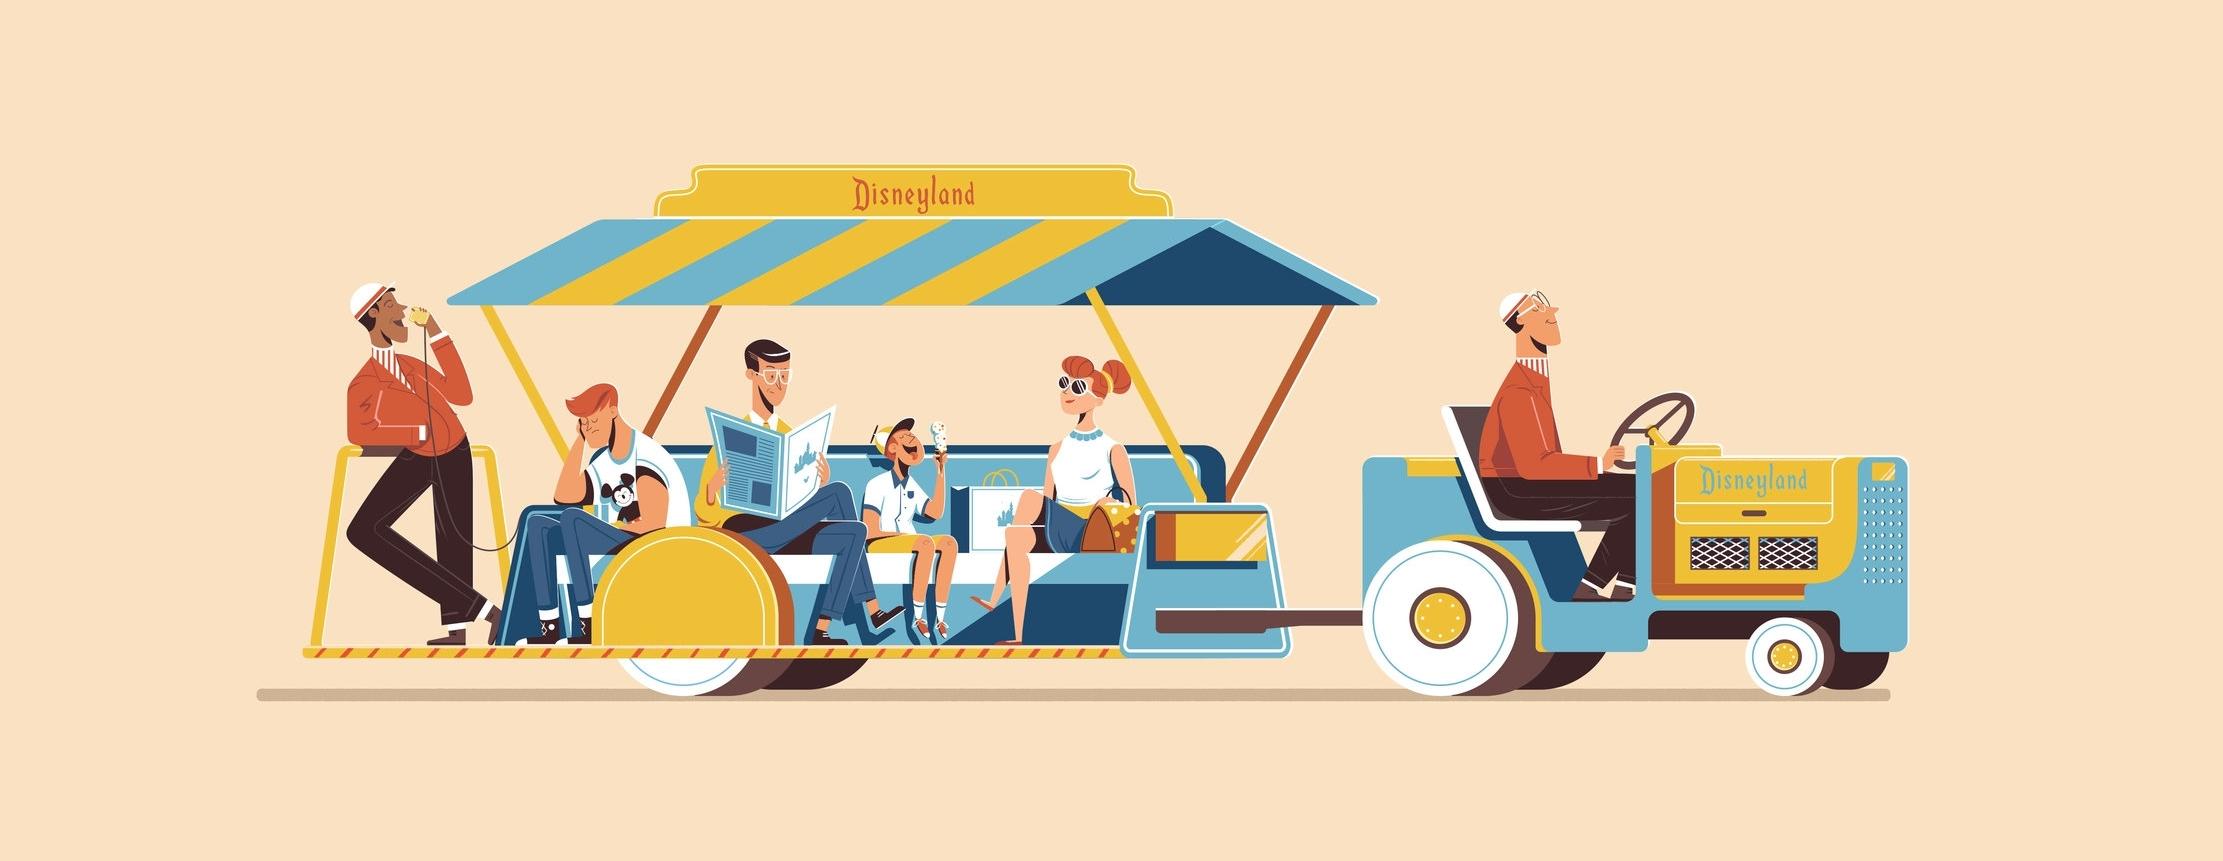 Expo '55 - Ride Vehicle Series